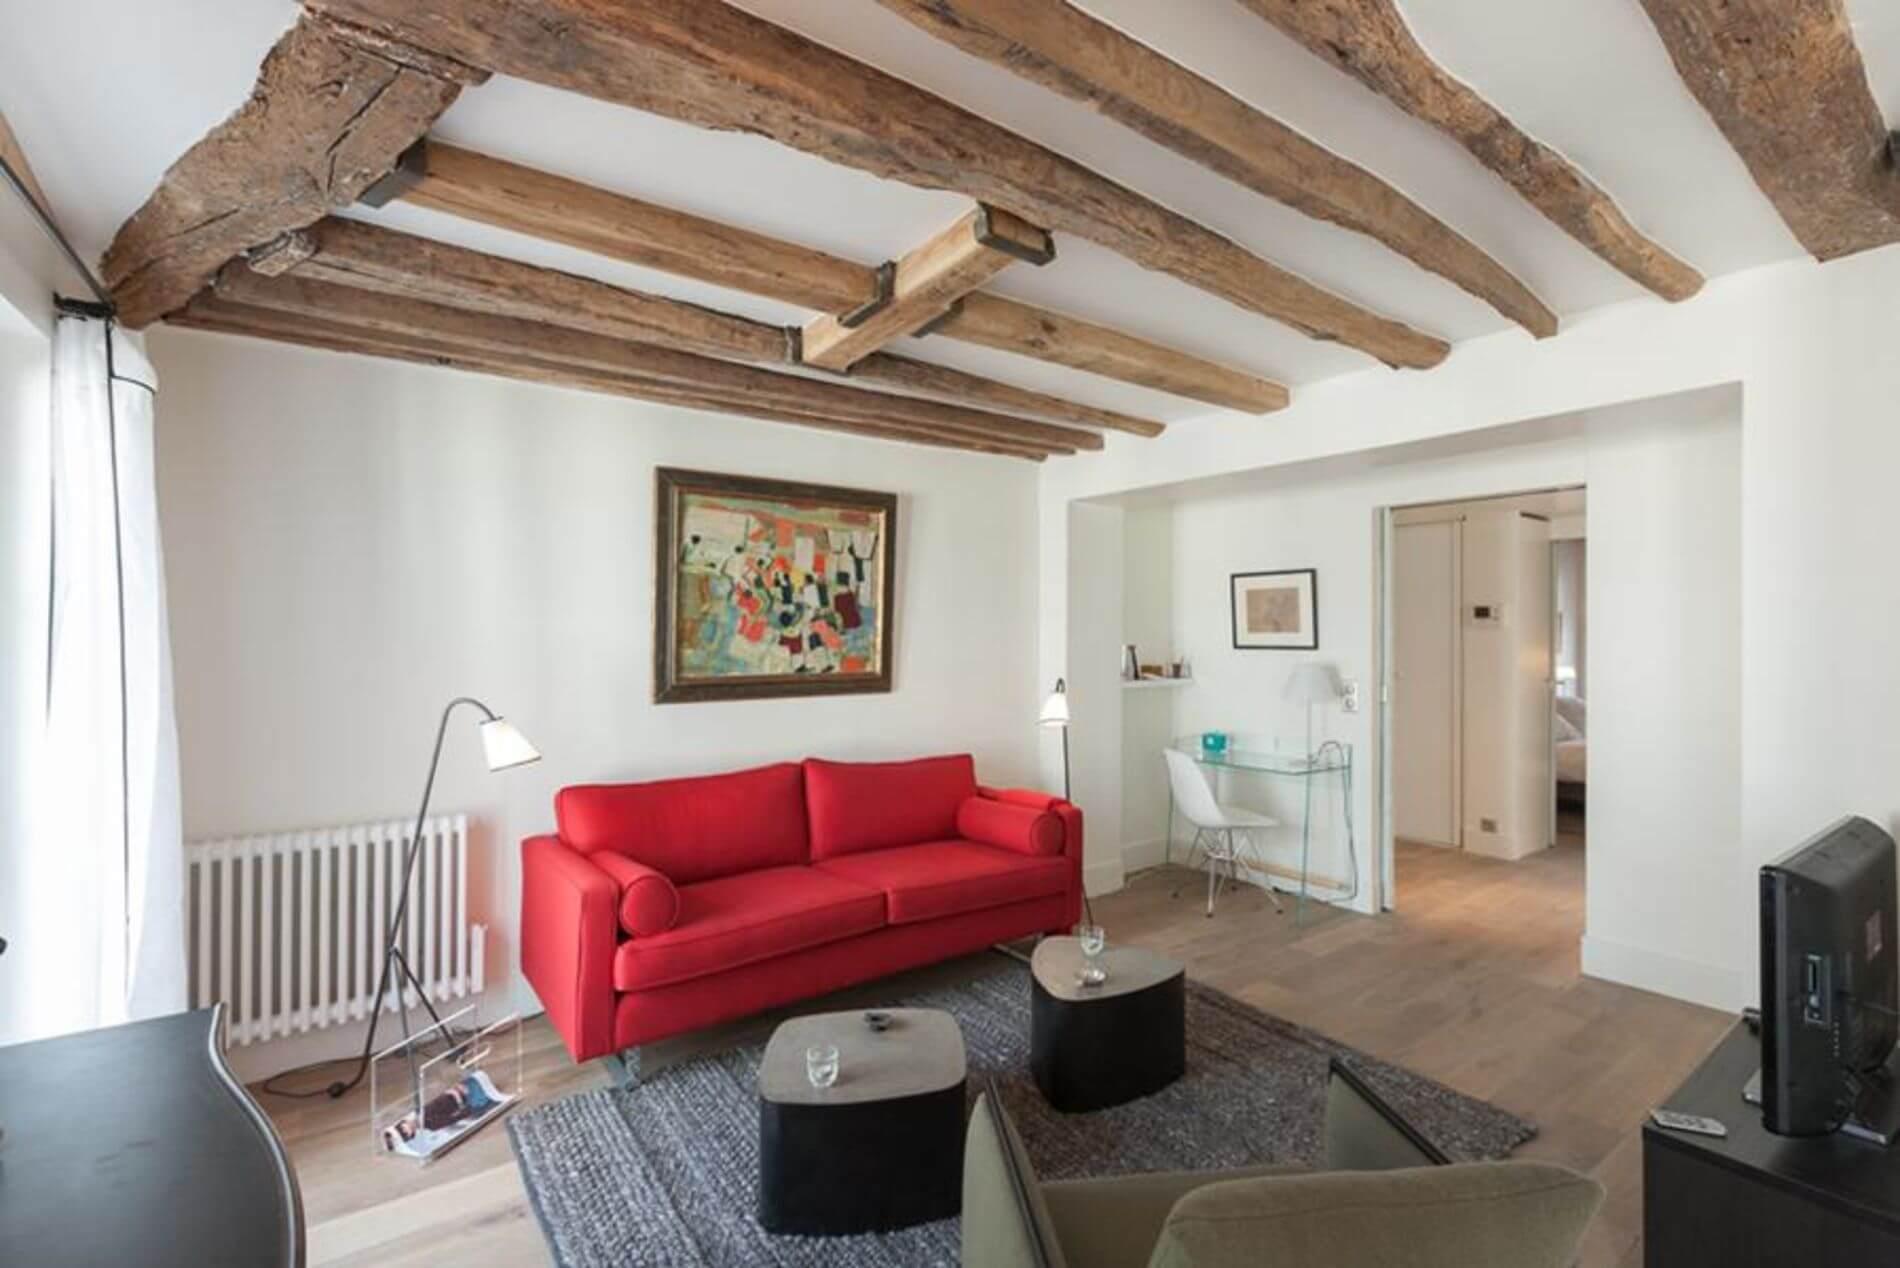 Modern serviced apartment in Saint Germain des Pres, Paris with a balcony